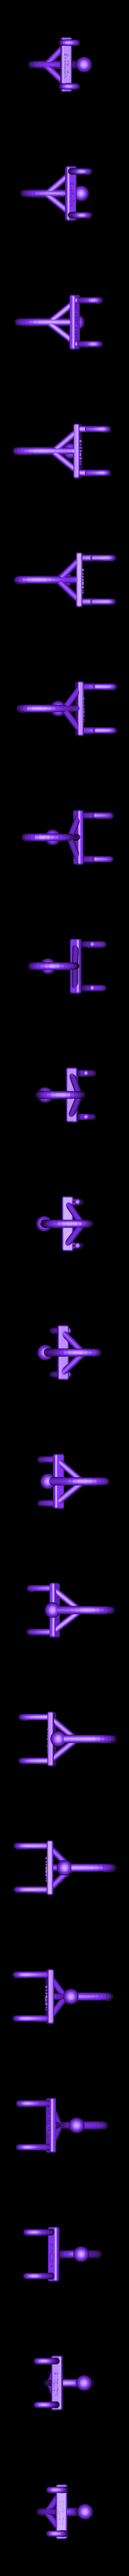 Hook2_NQT2015.stl Download free STL file Beach Umbrella Hook • 3D printing template, Caghon3d